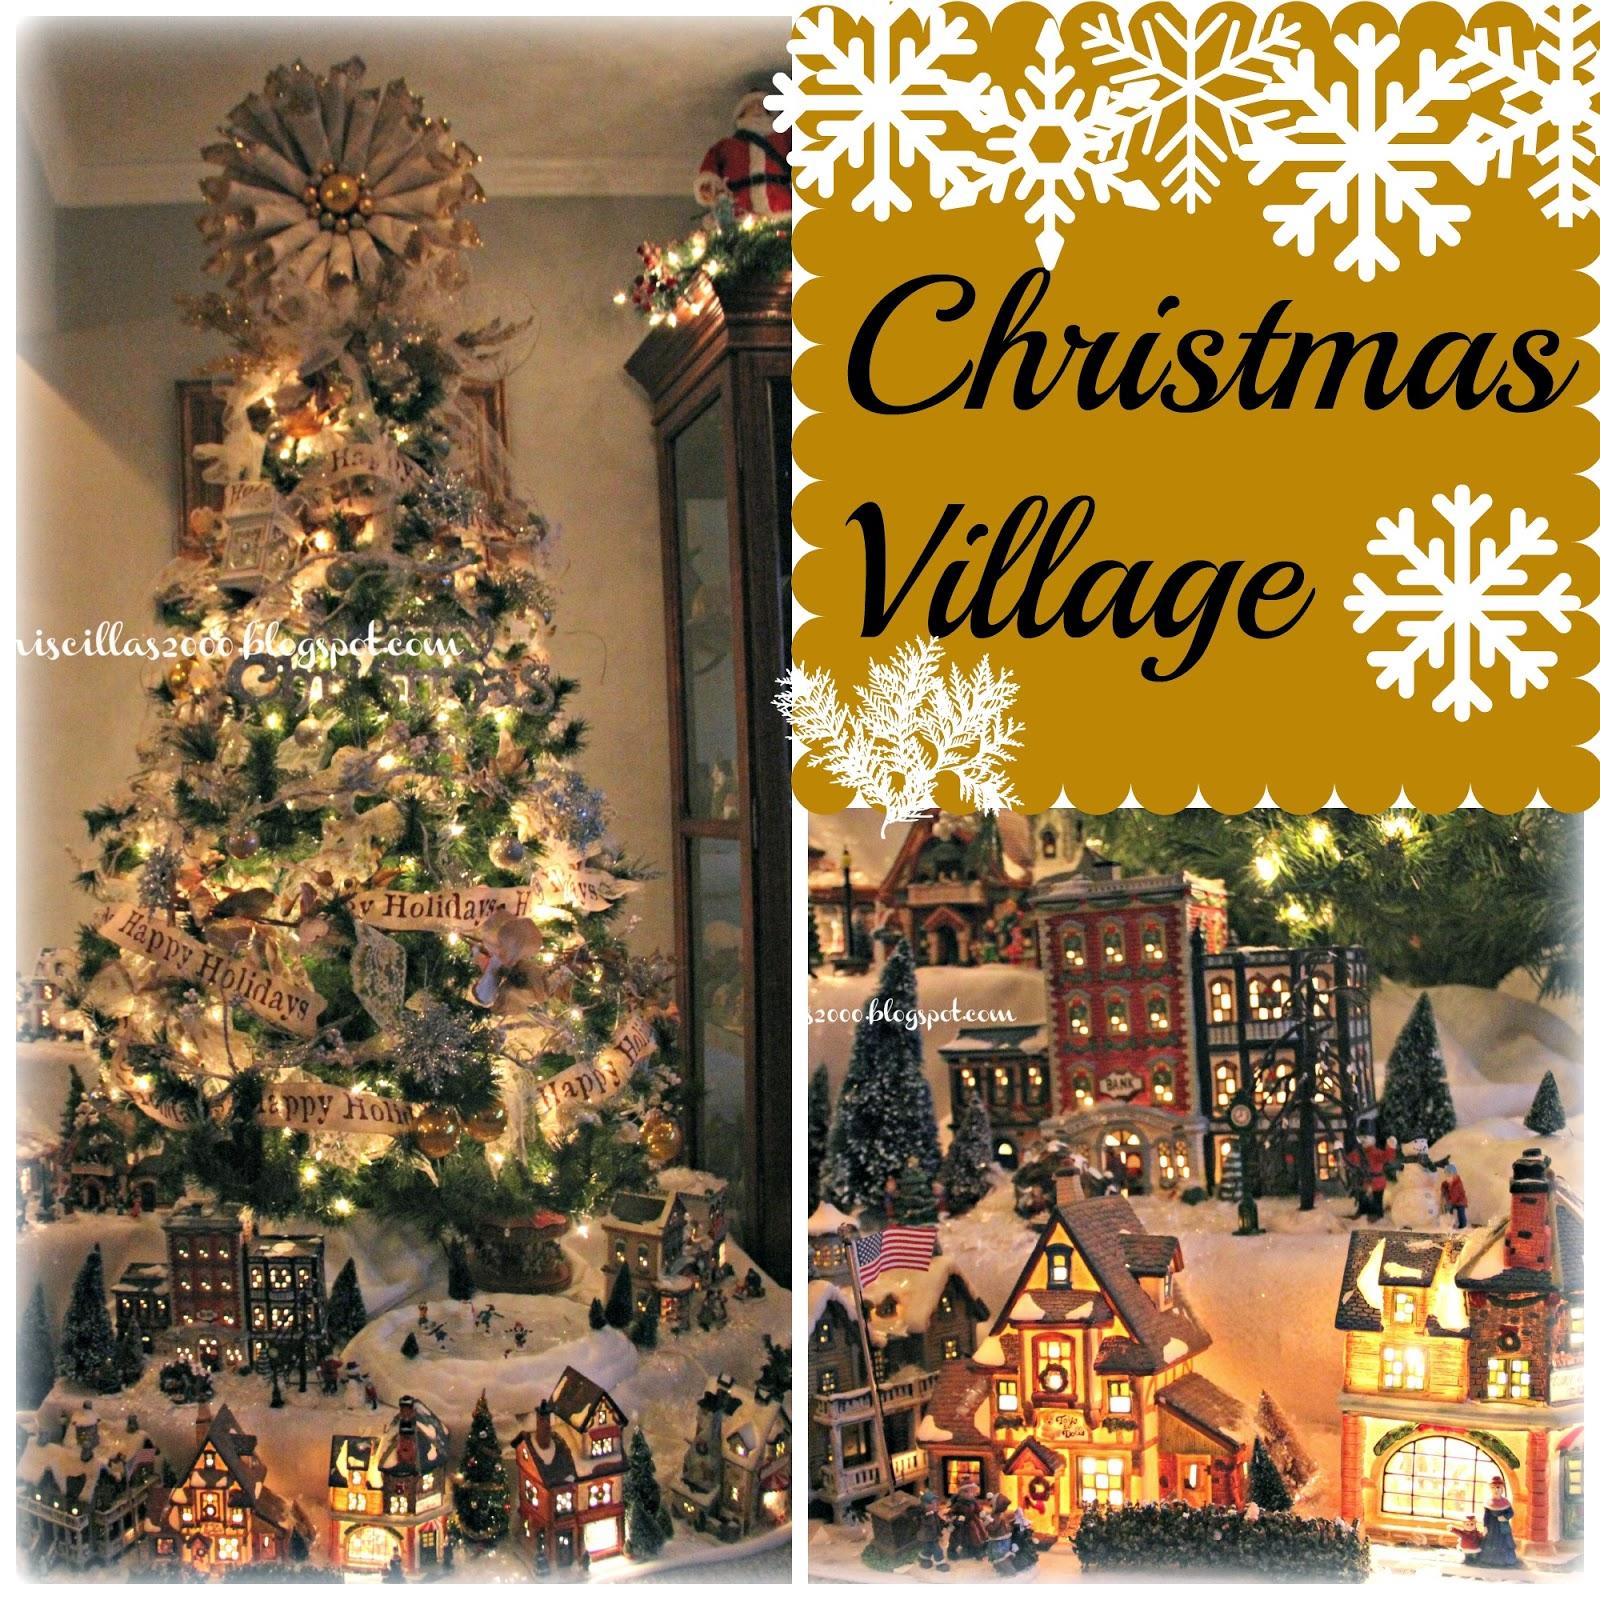 christmas village baltimore md